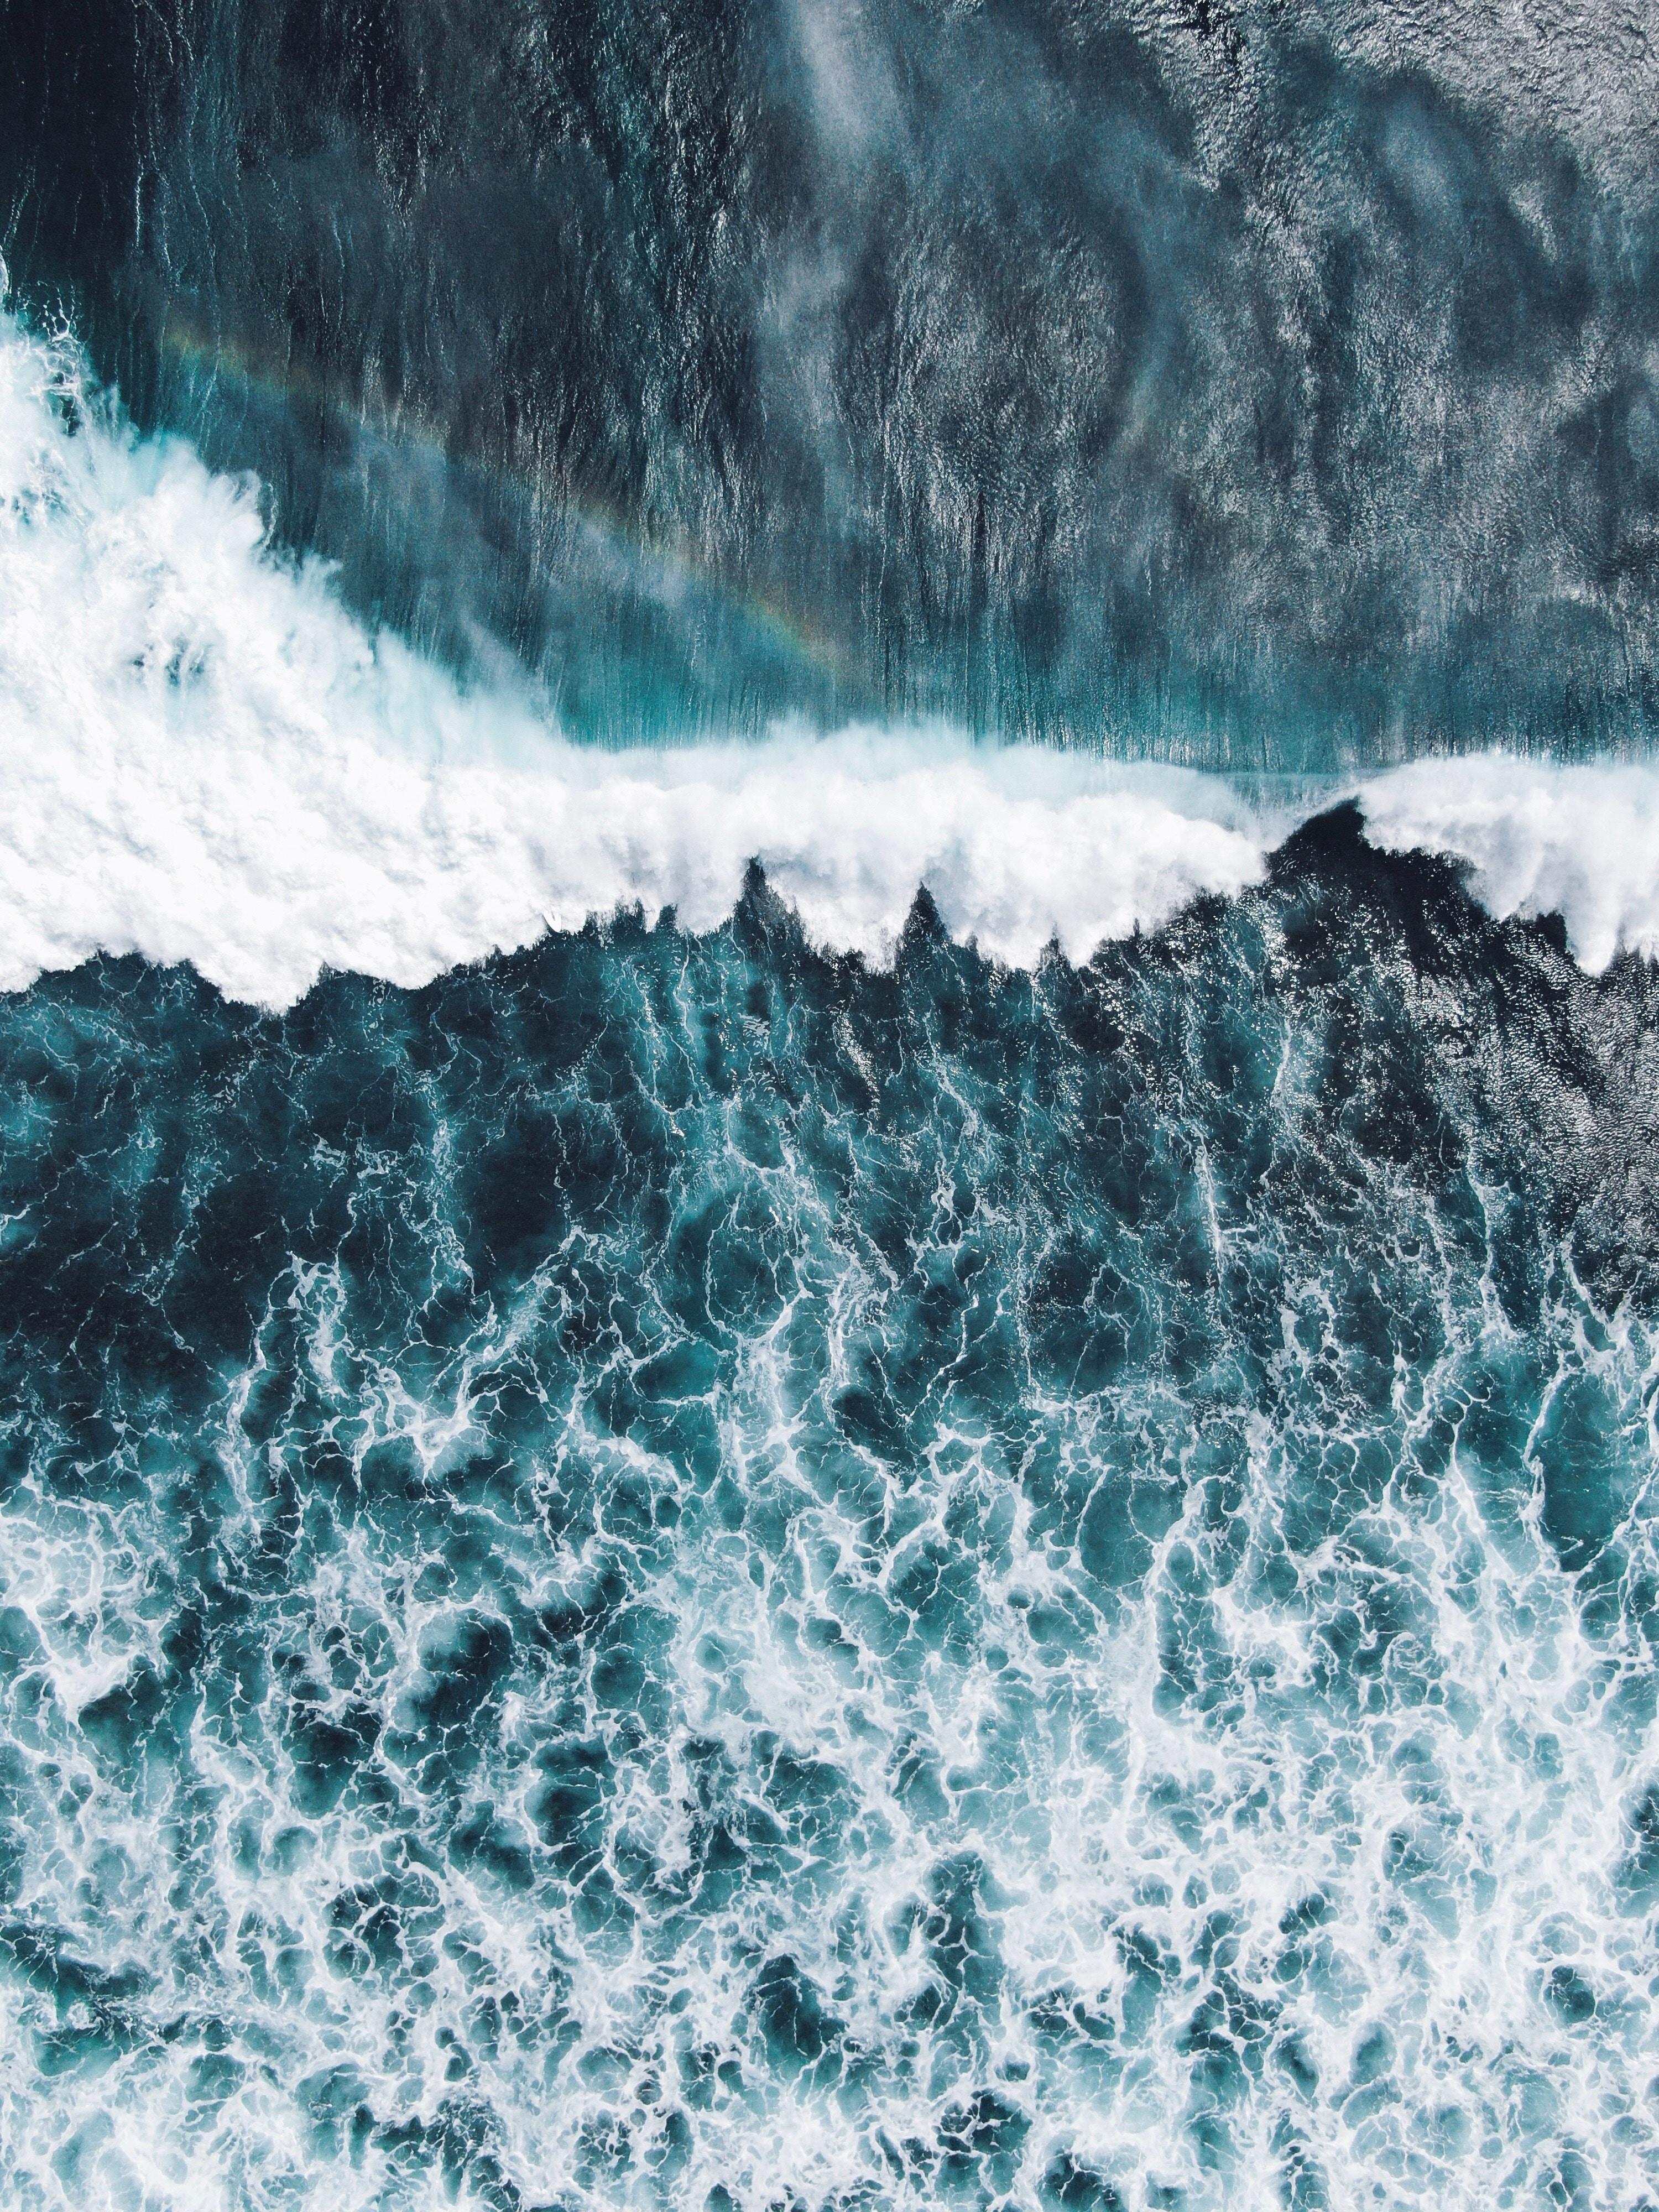 Ocean Aesthetic Water Background